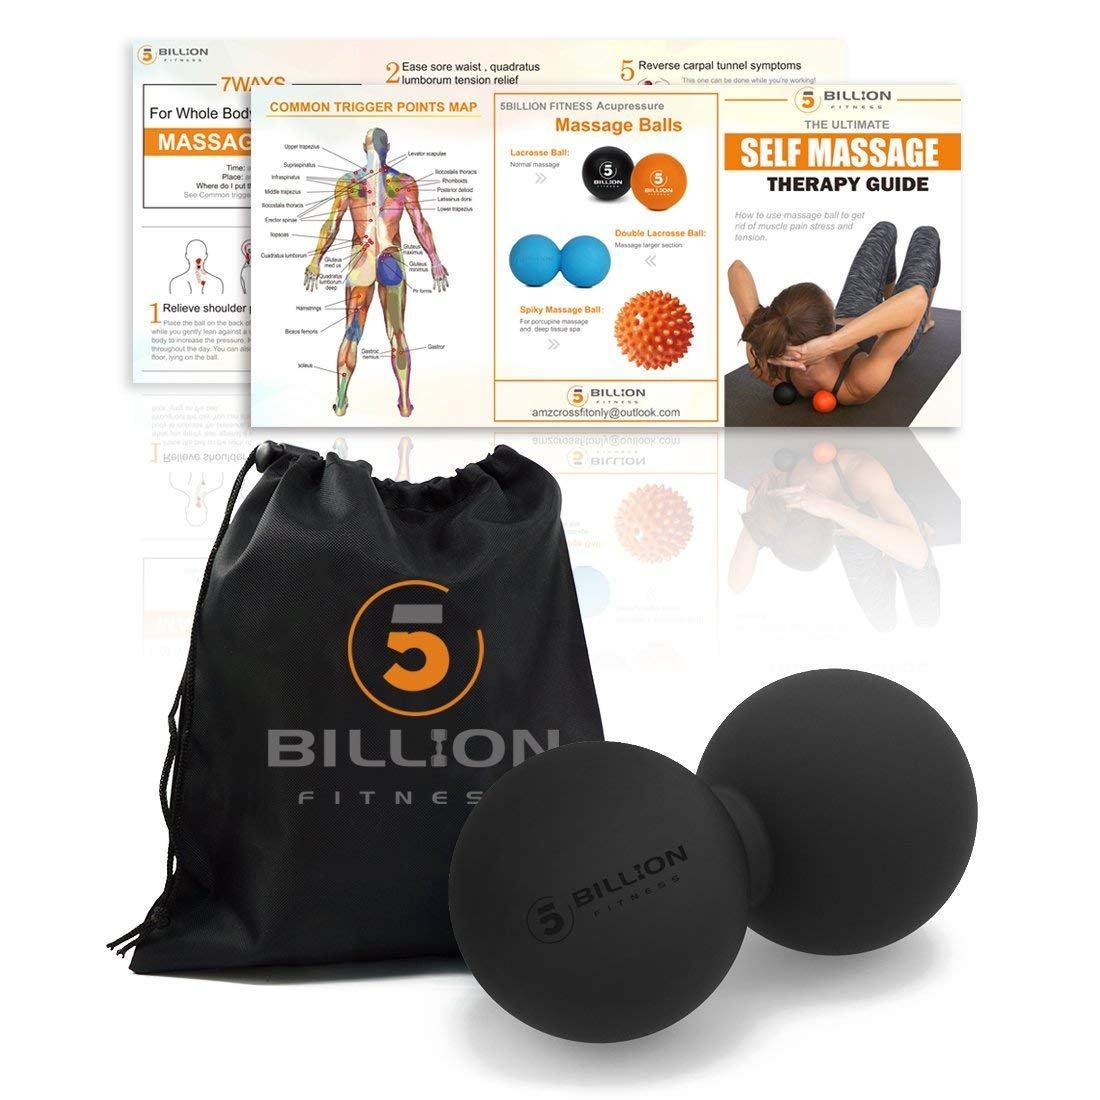 5BILLION Double Massage Ball - Pelota Lacrosse & Balon Fitness para Liberación Miofascial & Masaje Muscular - Herramienta de Masaje de Alta Densidad ...